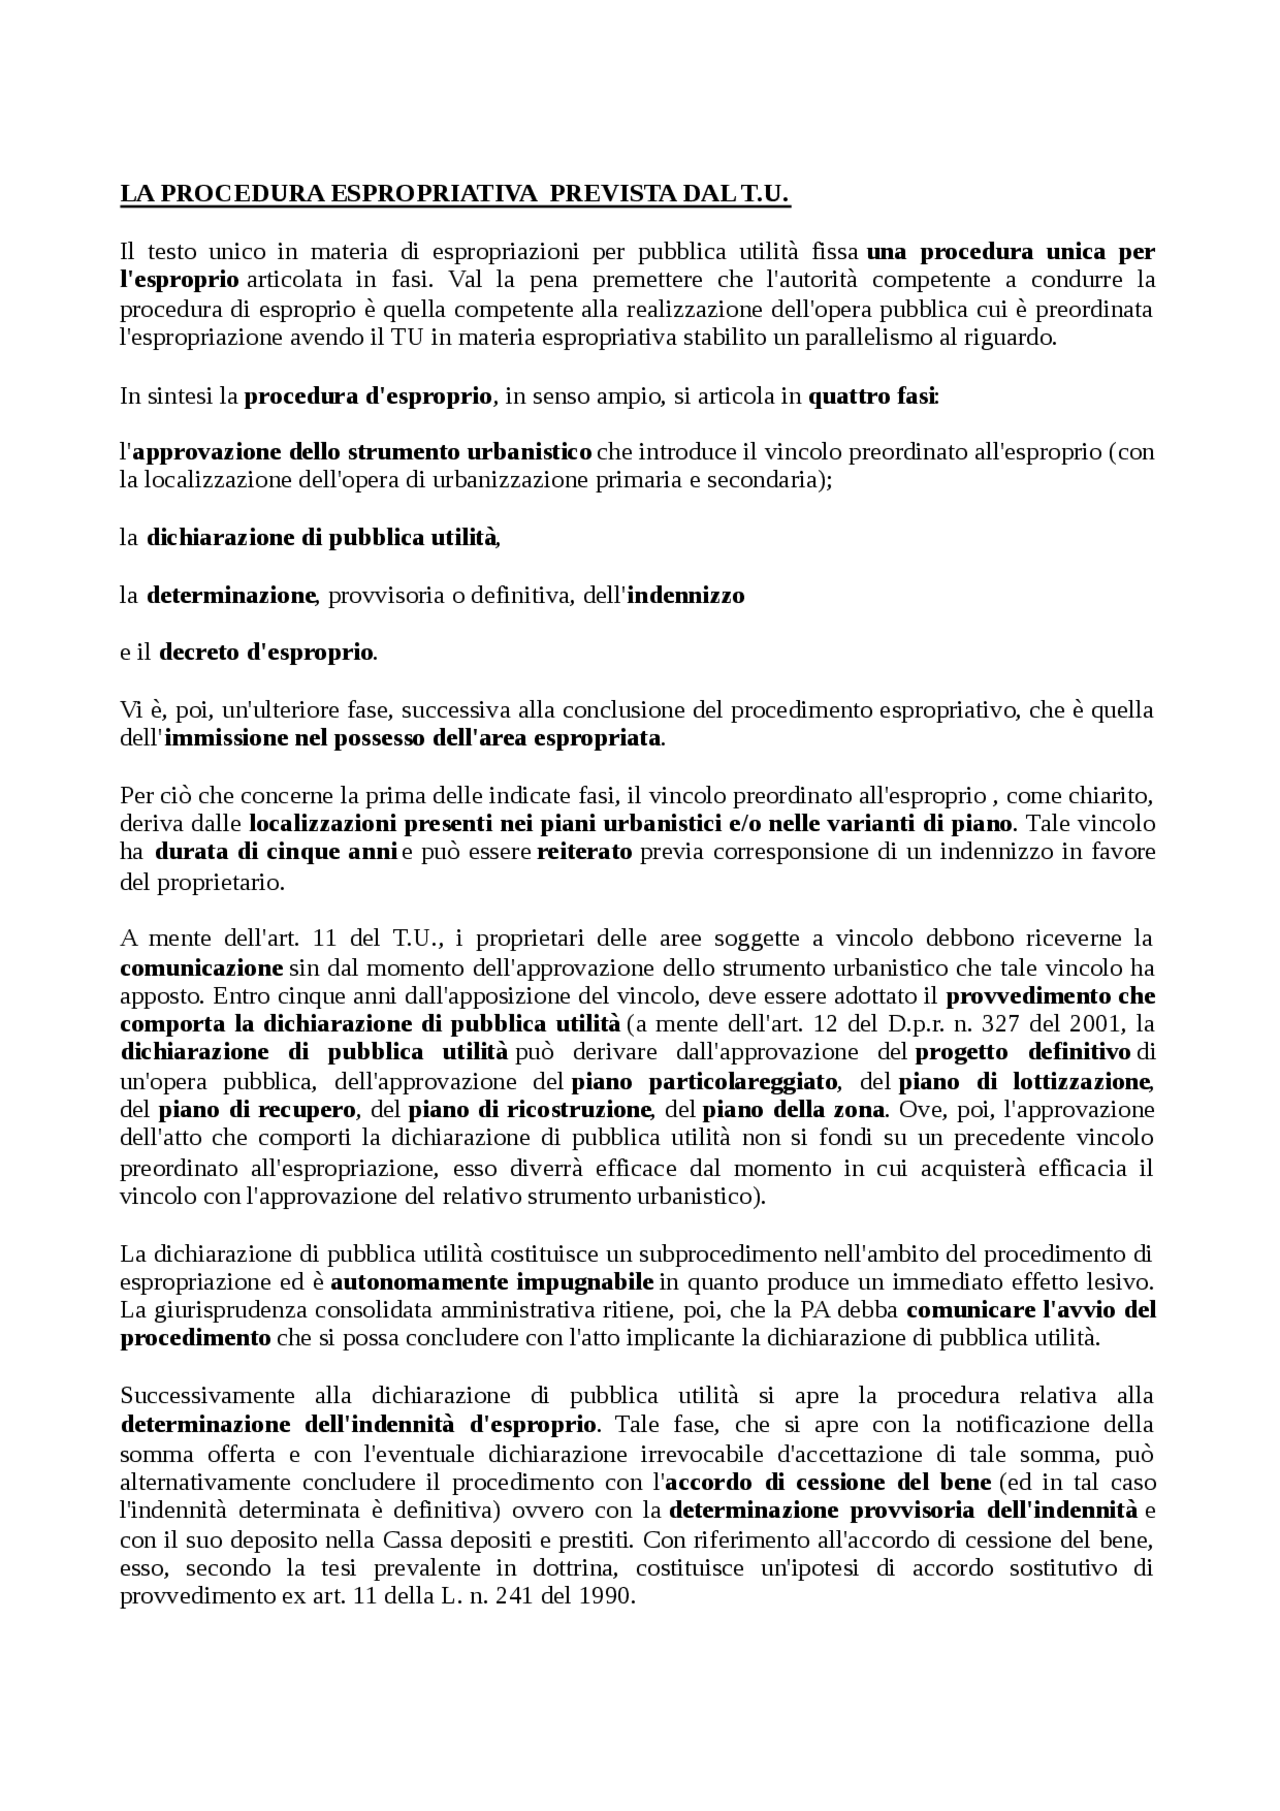 La Procedura Espropriativa Prevista Dal T U Docsity